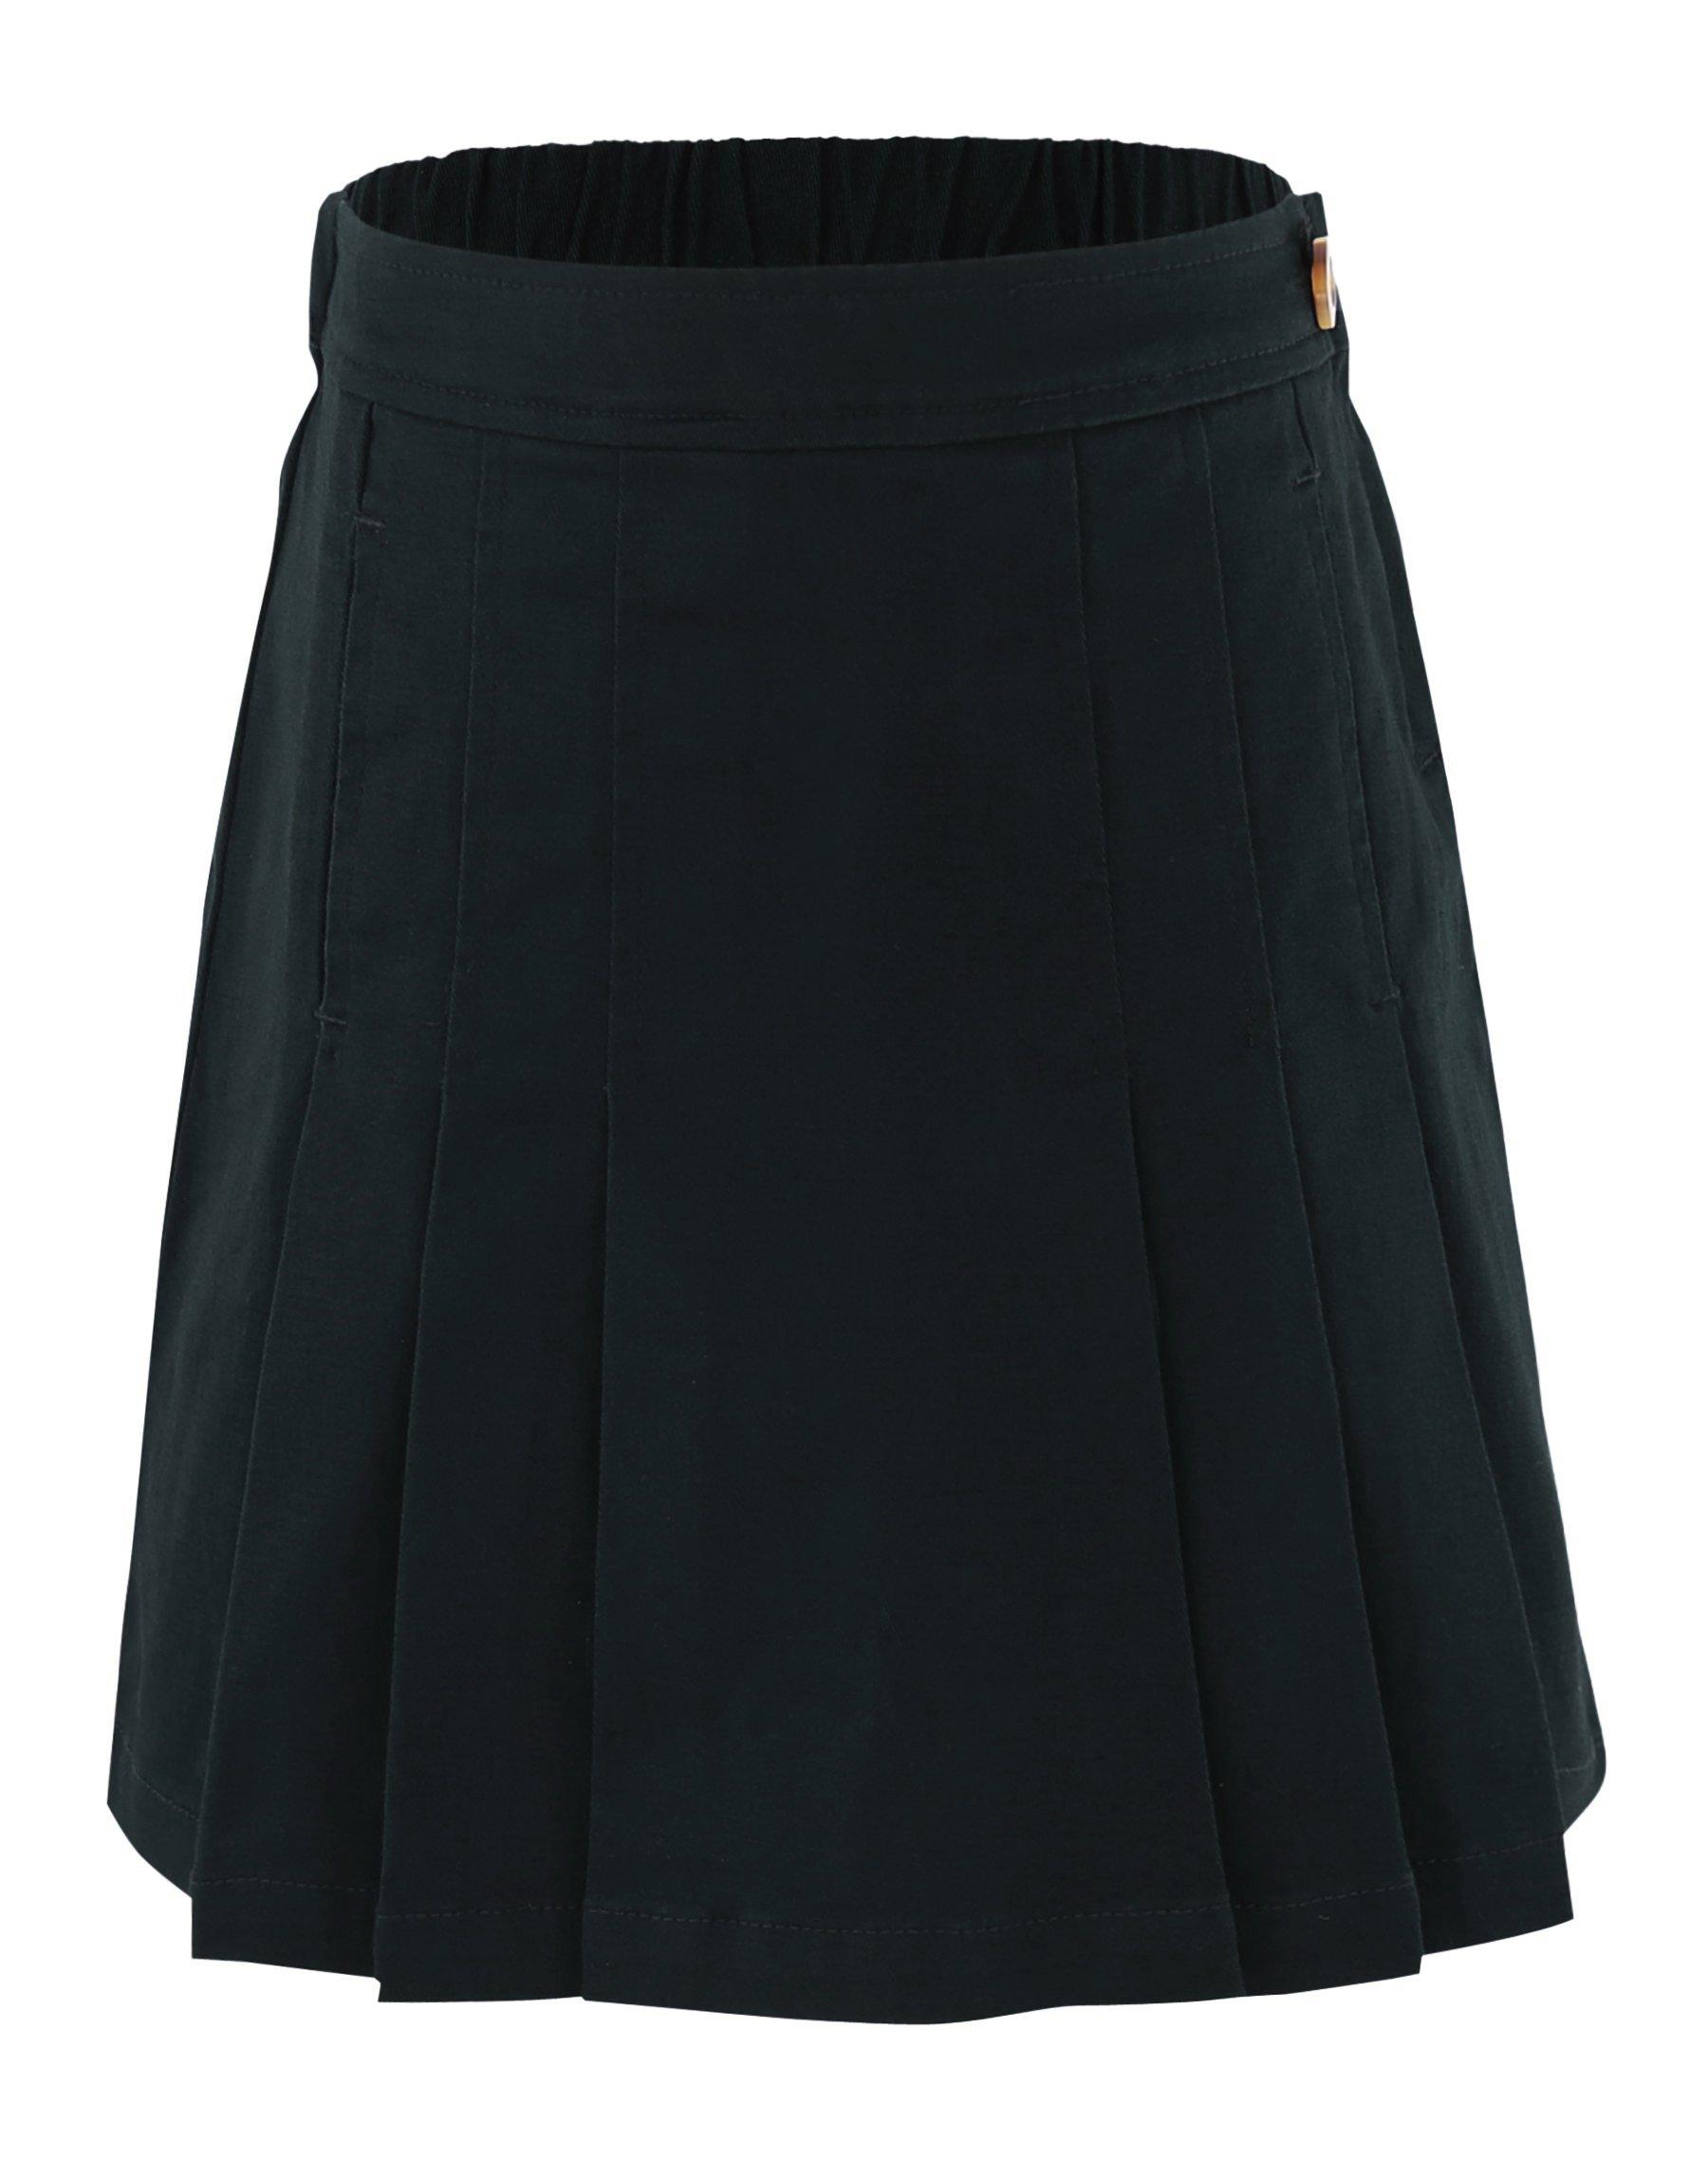 Bienzoe Girl's Cotton Stretchy School Uniforms Pleated Skirt Black Size 6X